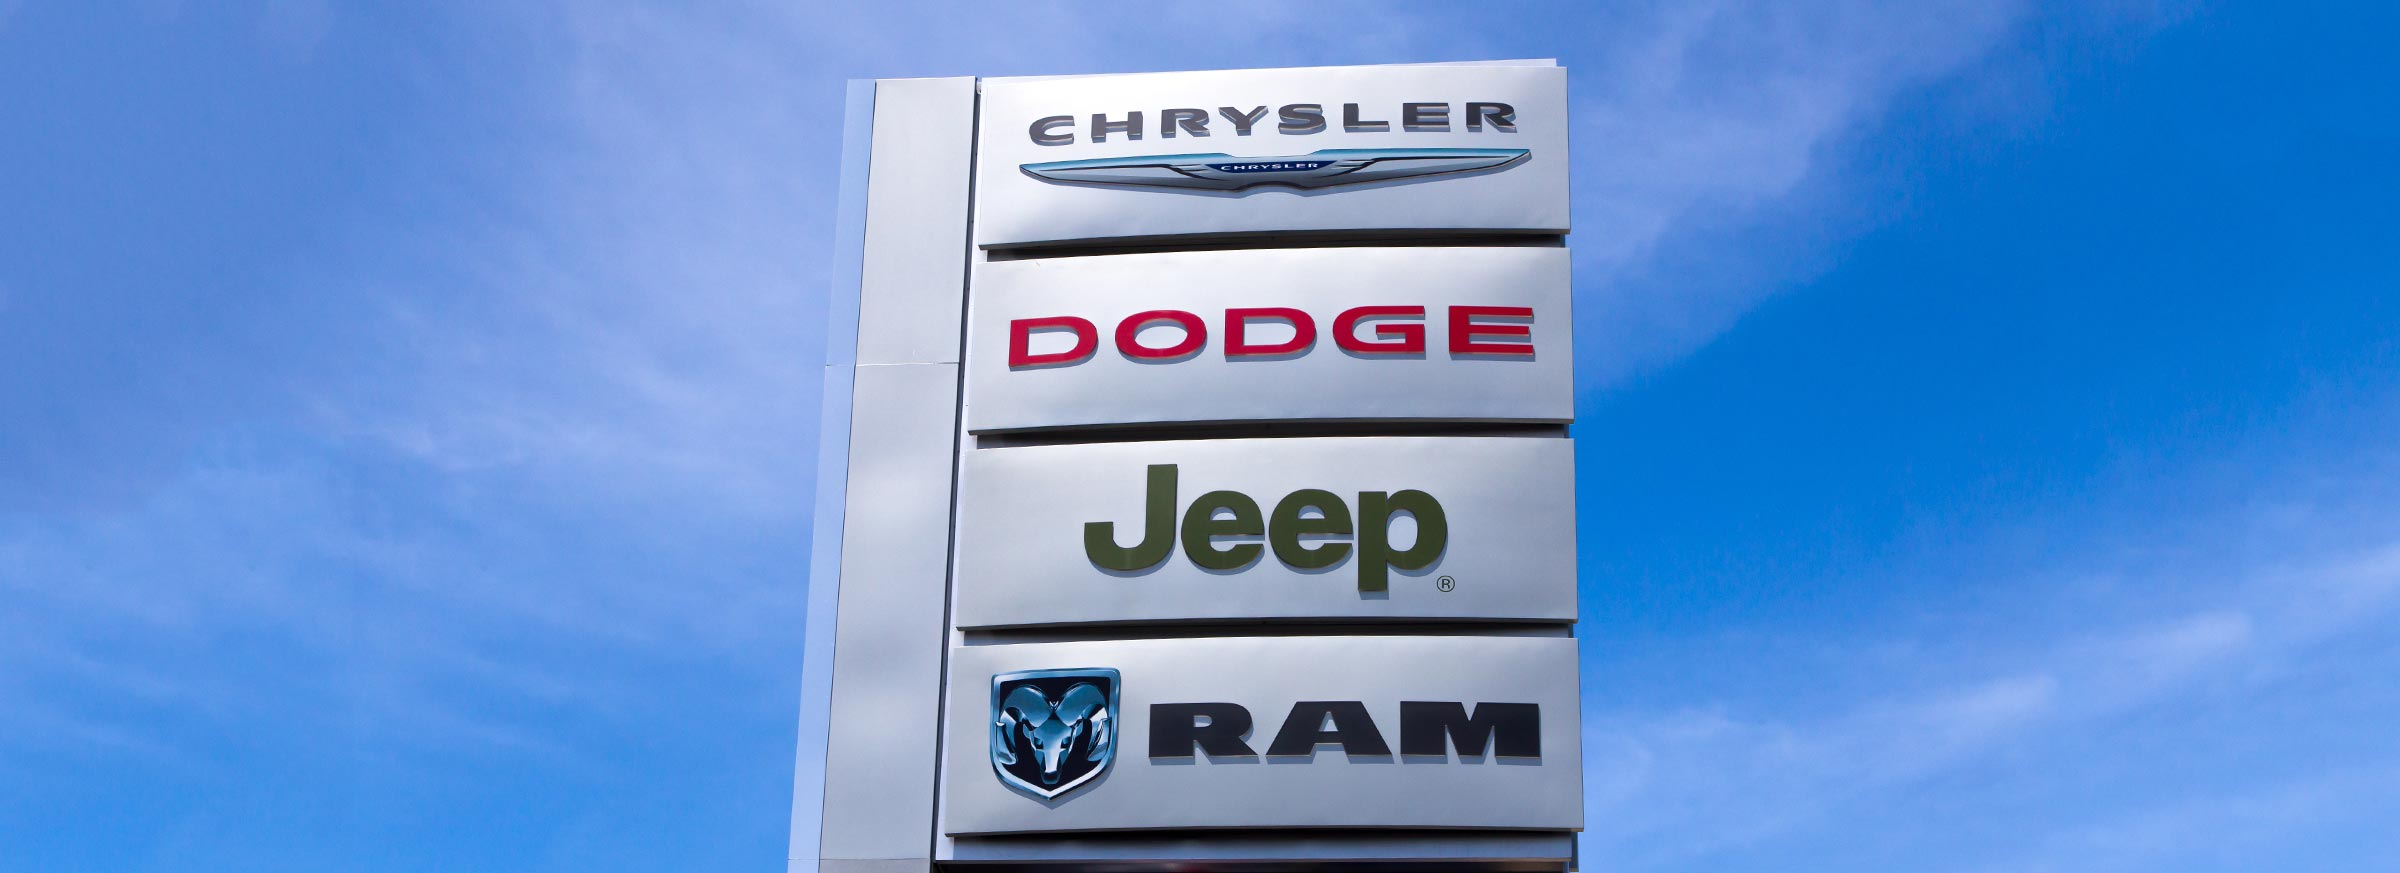 Top Jeep Chrysler Jeep Dodge Ram